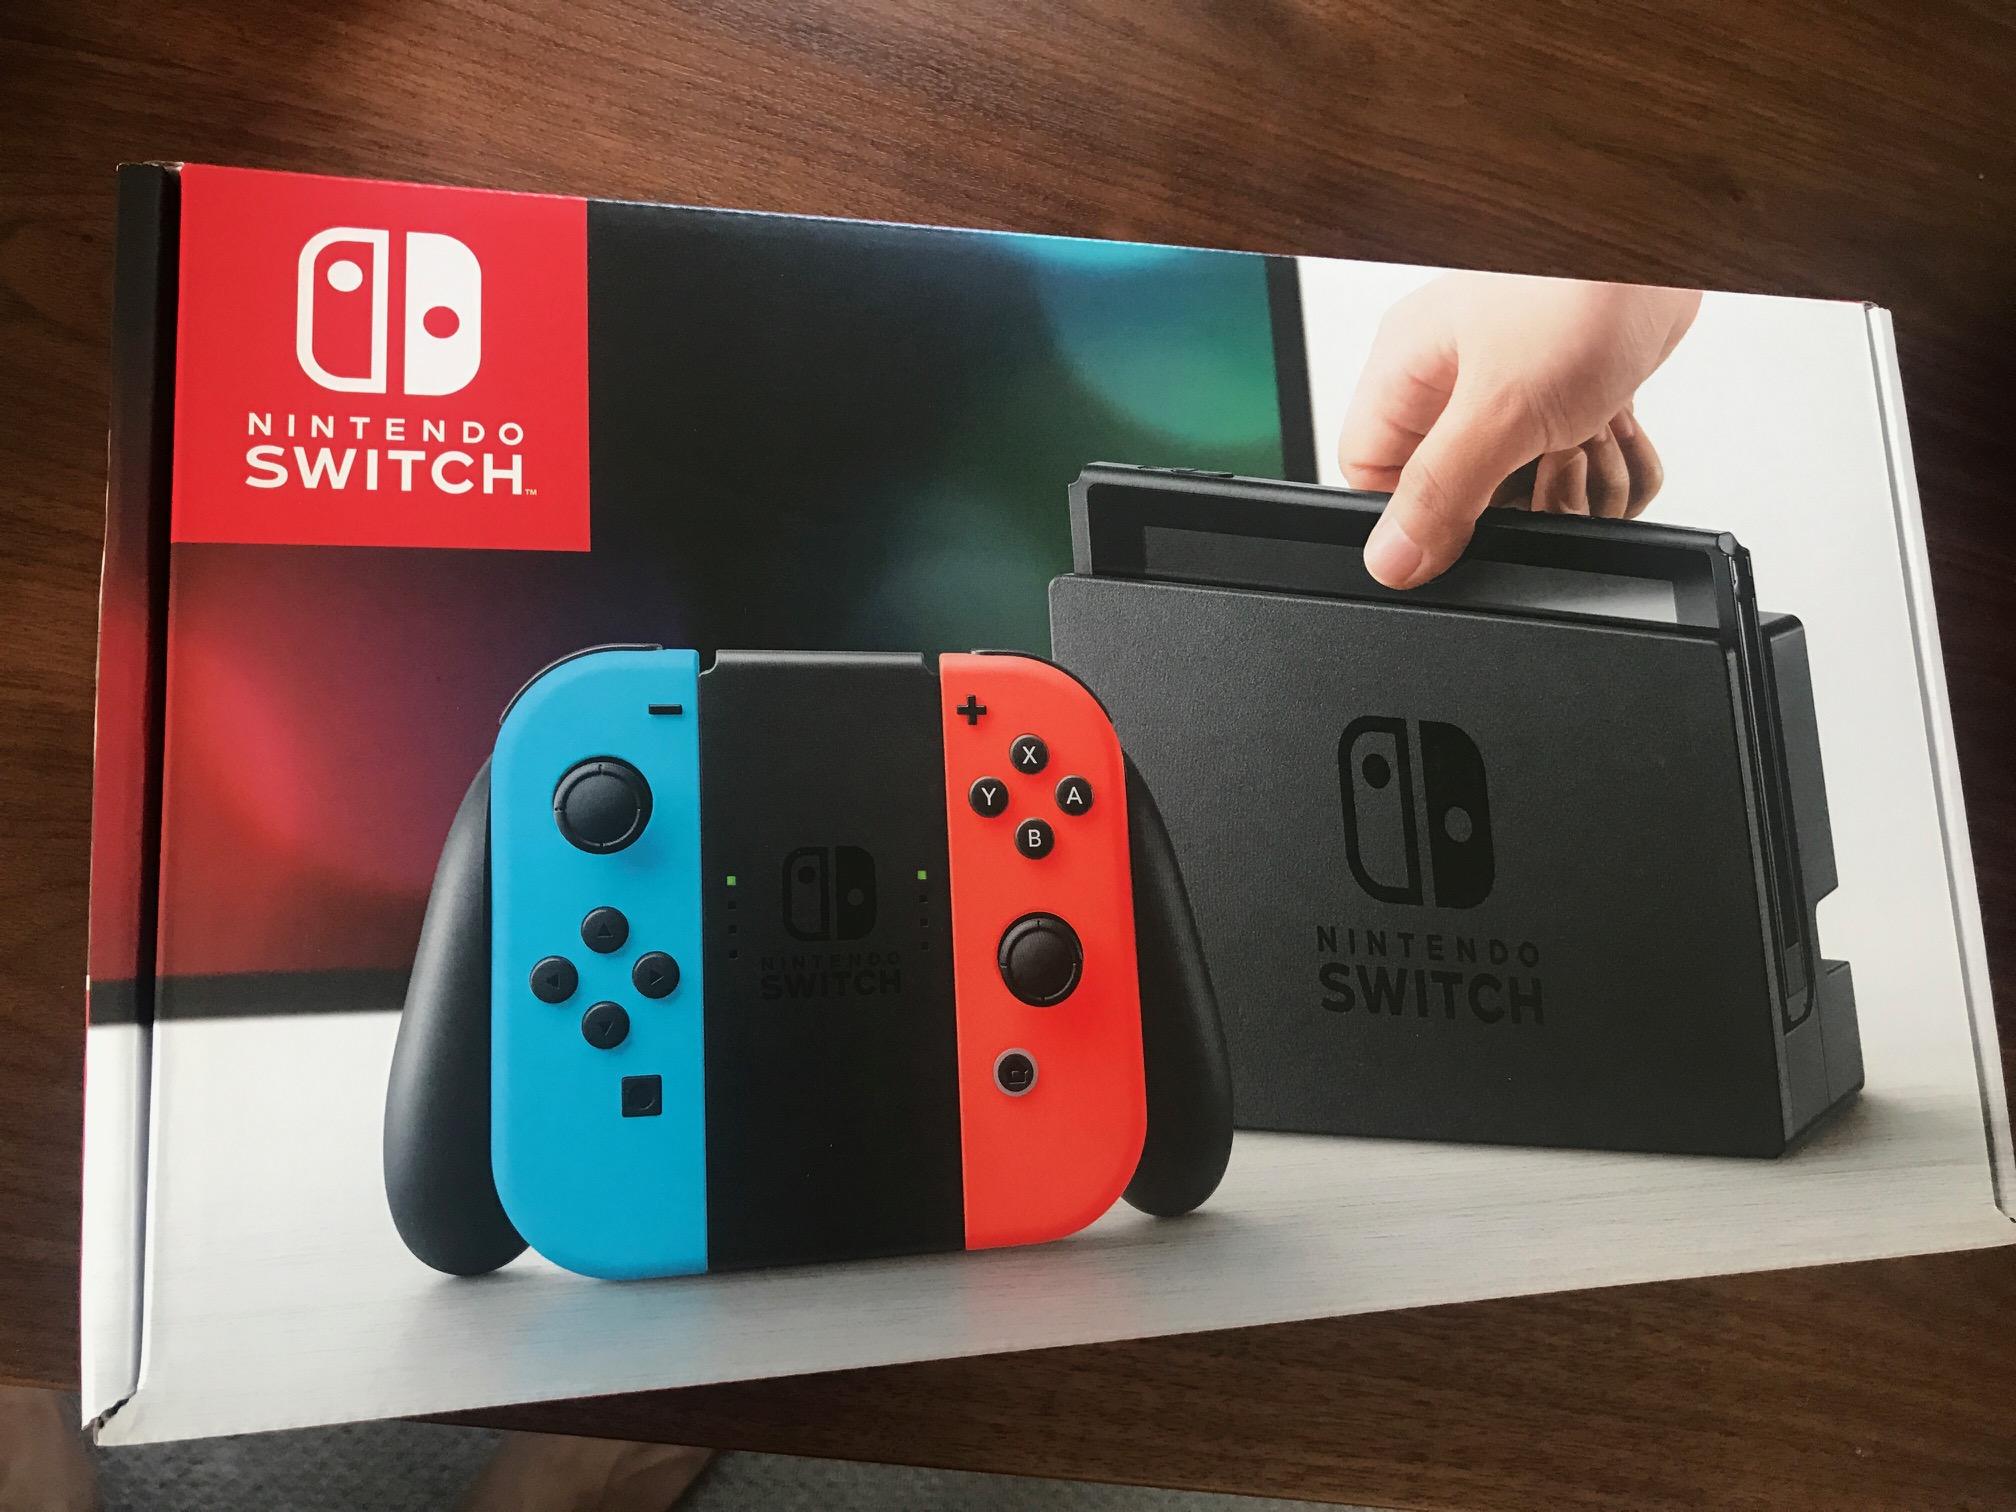 Nintendo Switch(スイッチ)をゲットするオススメの方法